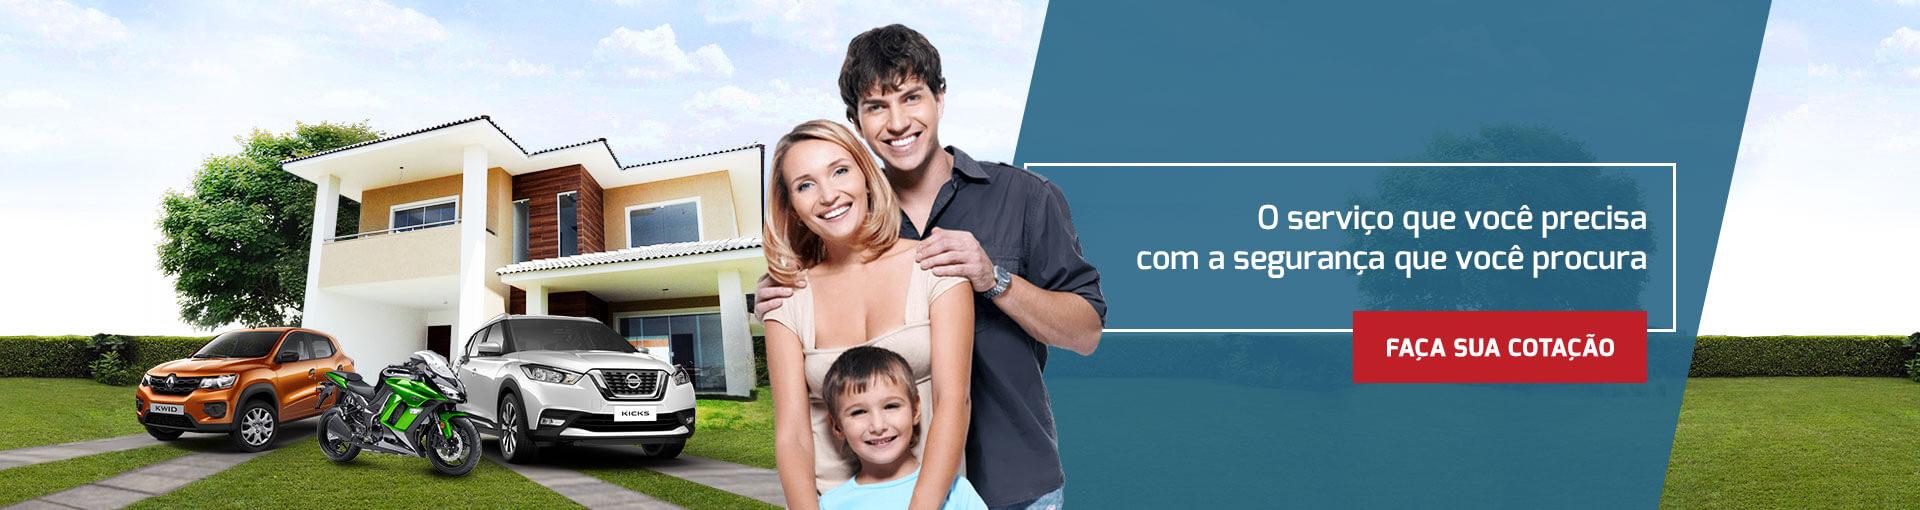 Consorcio Globo